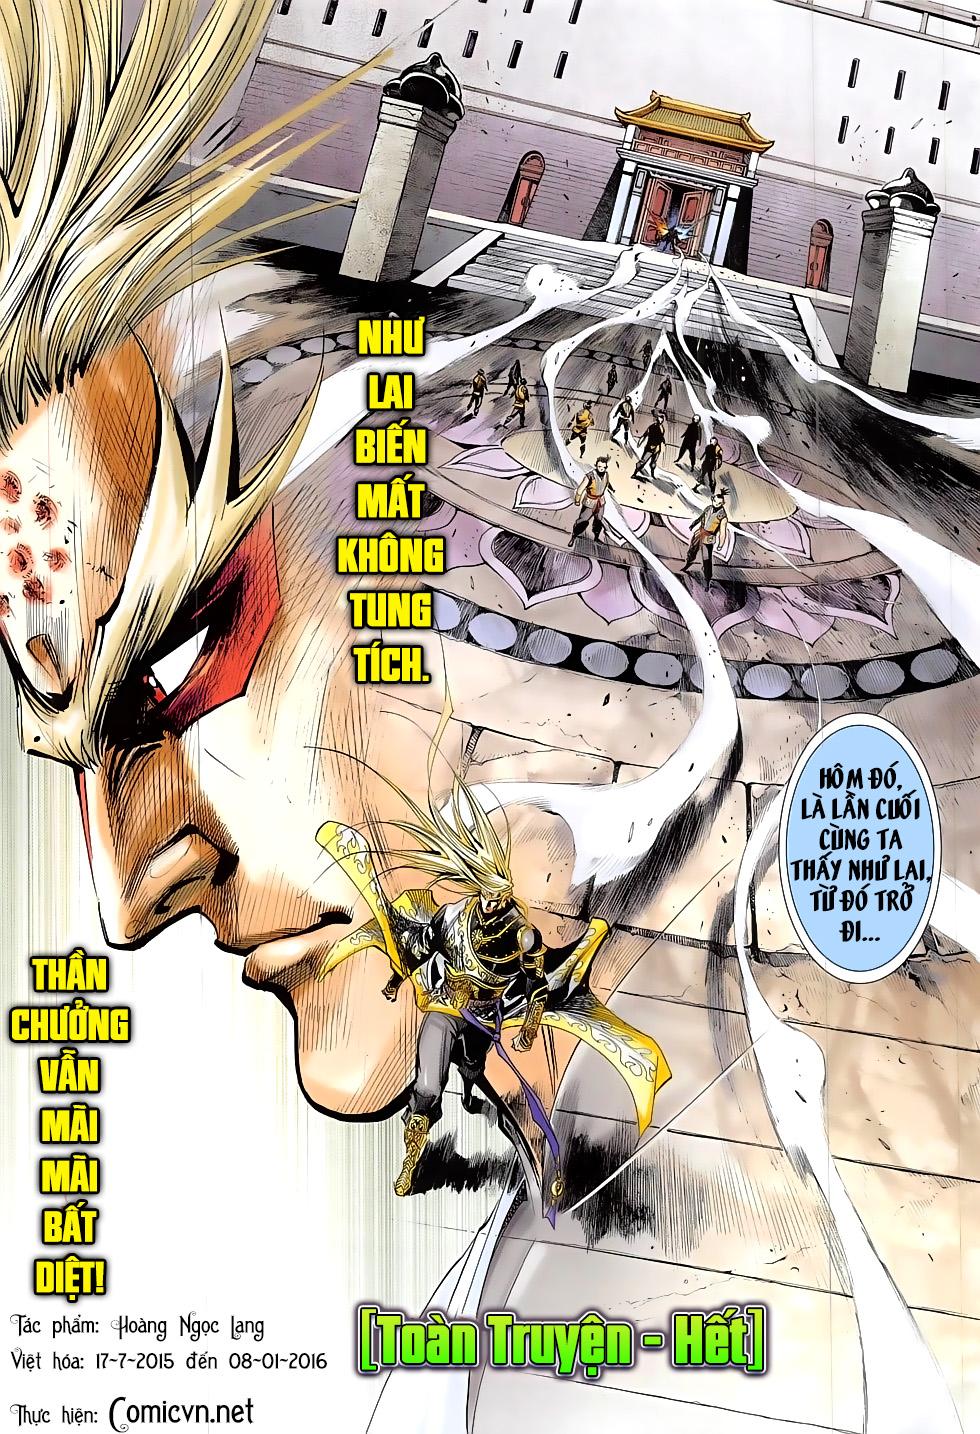 Thần Chưởng chap 24 – End Trang 31 - Mangak.info